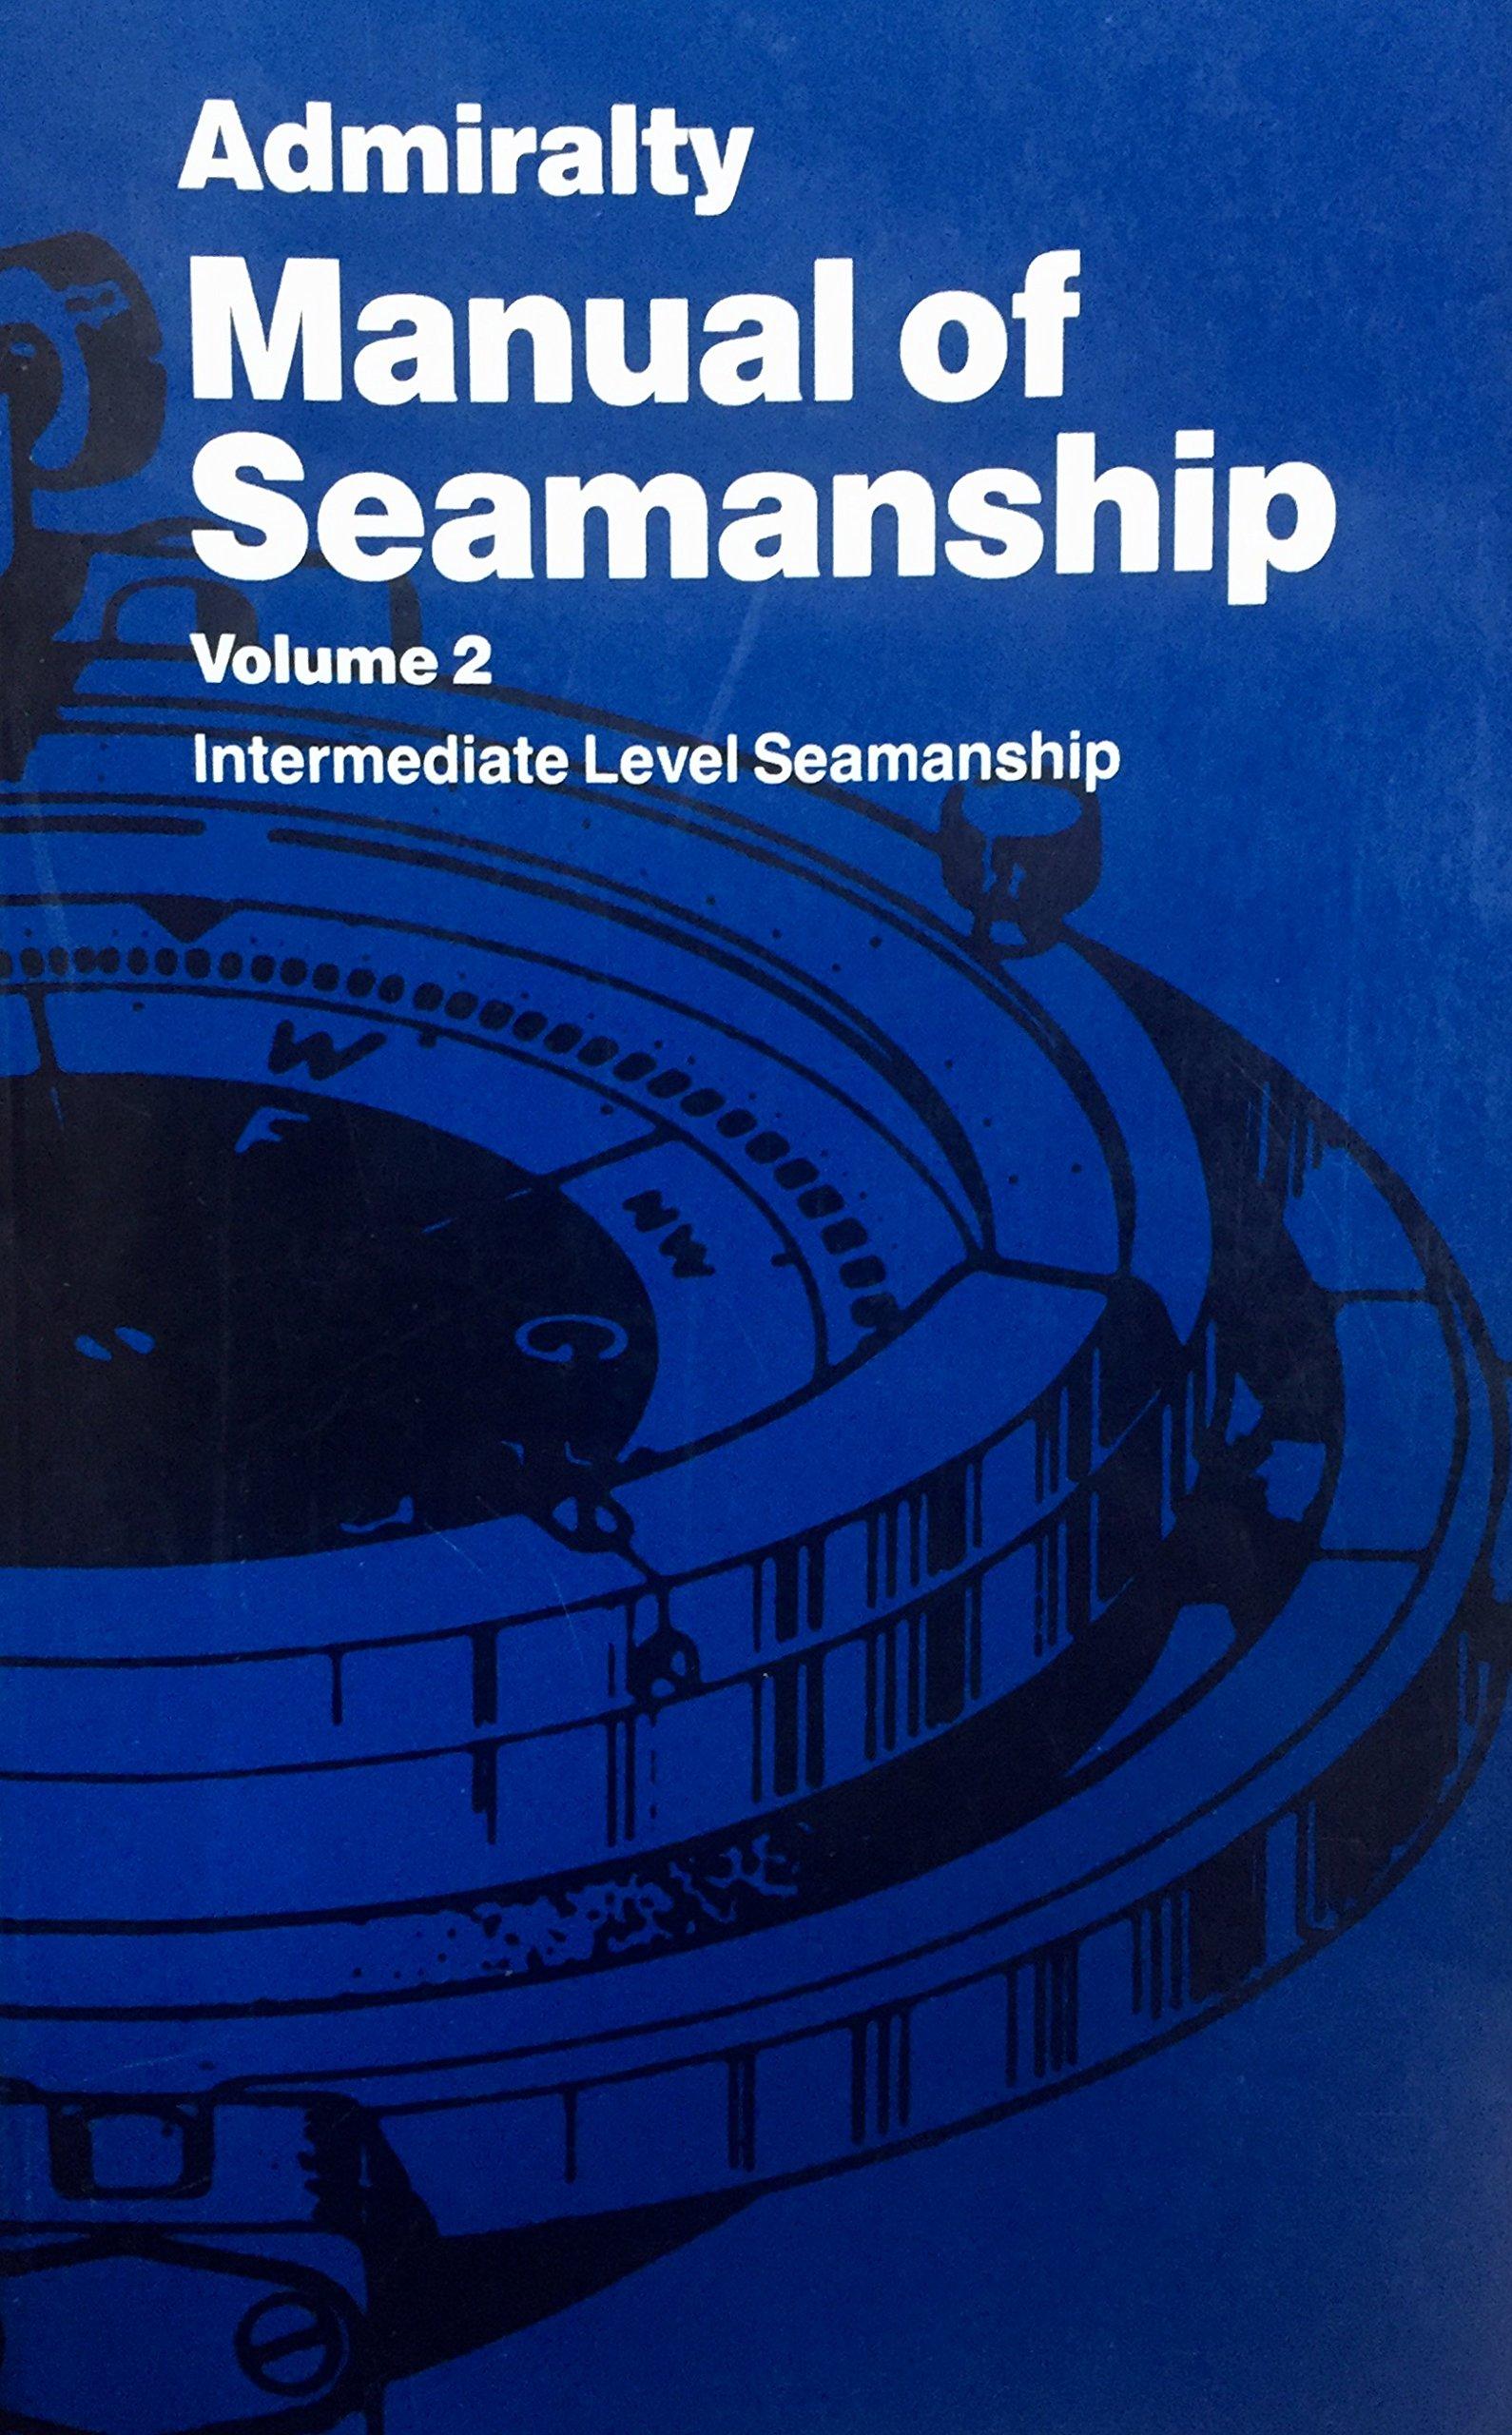 Admiralty Manual of Seamanship: v. 2 (B.R.67 (2) S.): Amazon.co.uk: Navy  Dept.: 9780117723450: Books